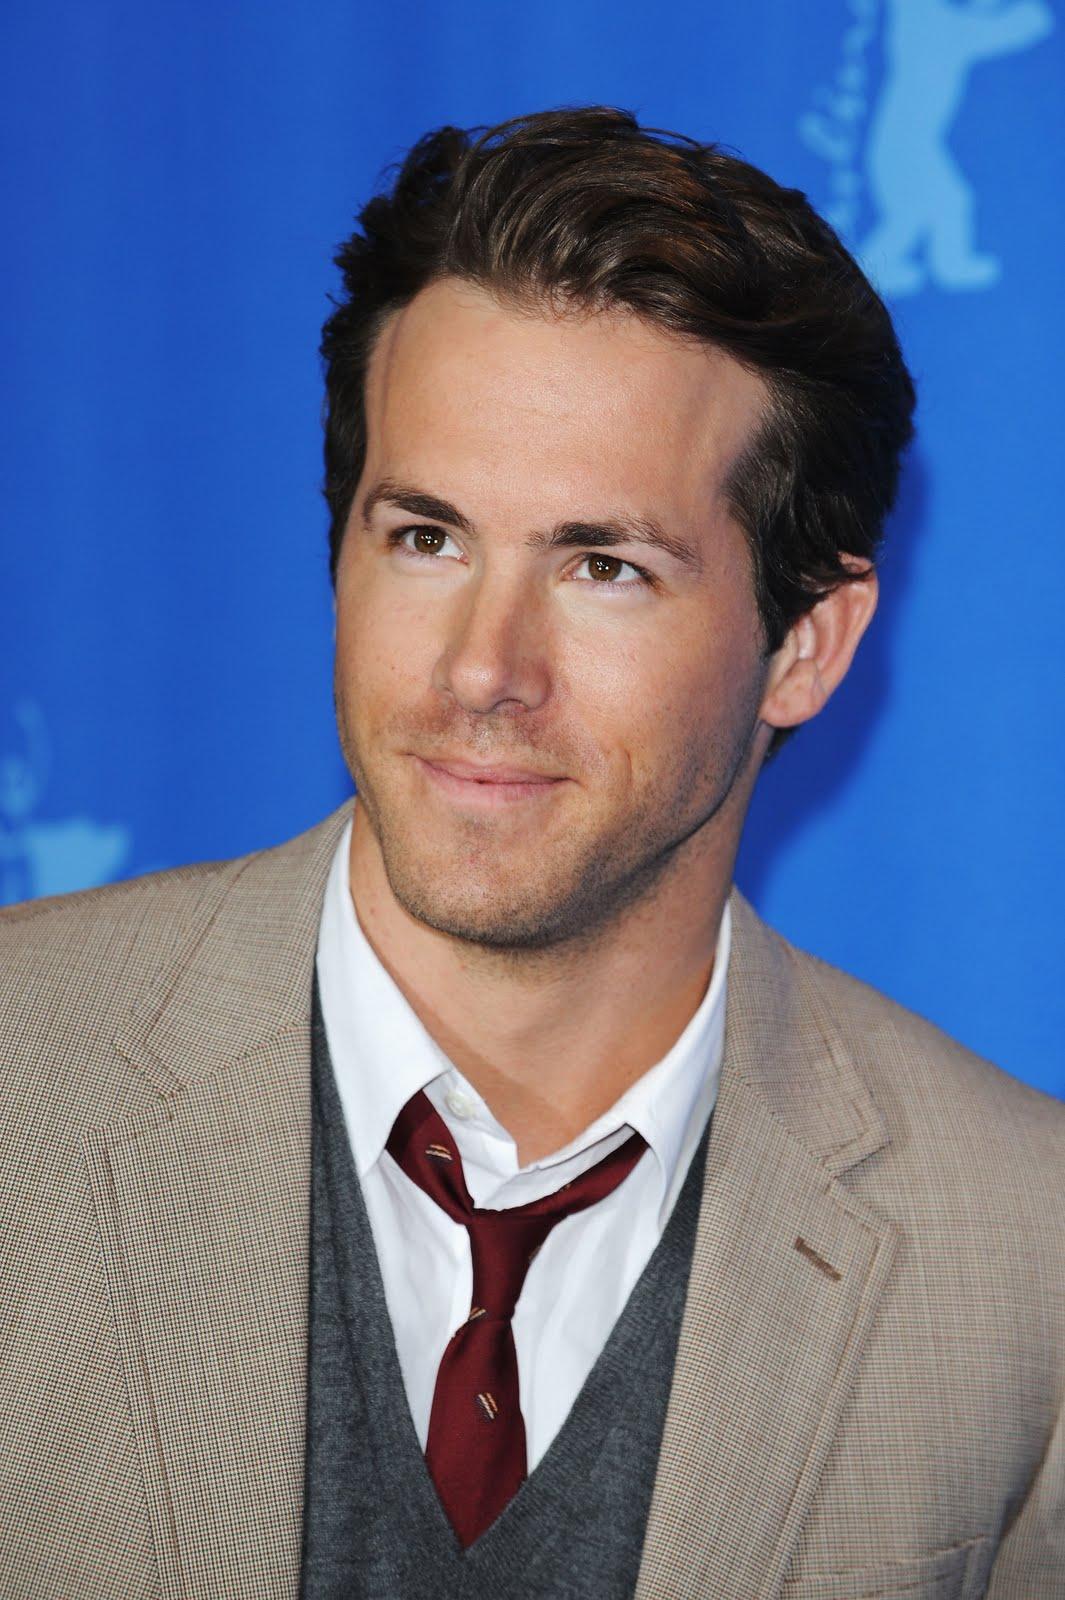 grthitz: Ryan Reynolds Ryan Reynolds